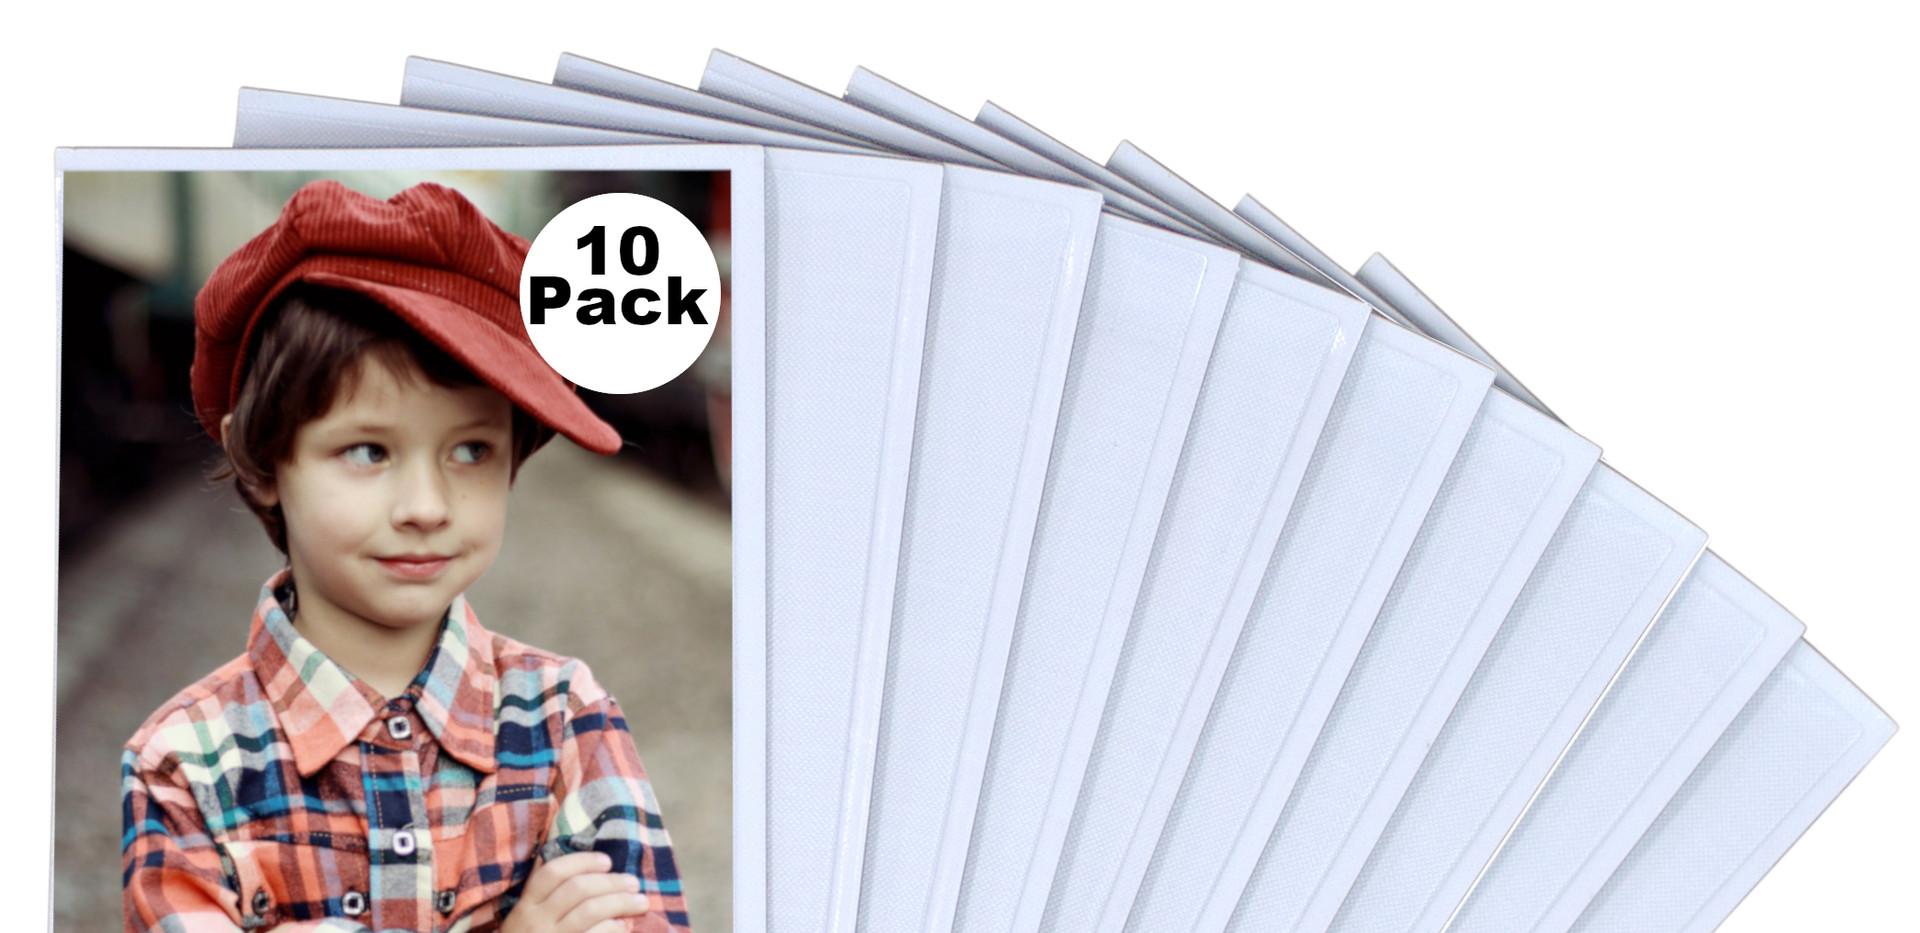 10-pack main.jpg